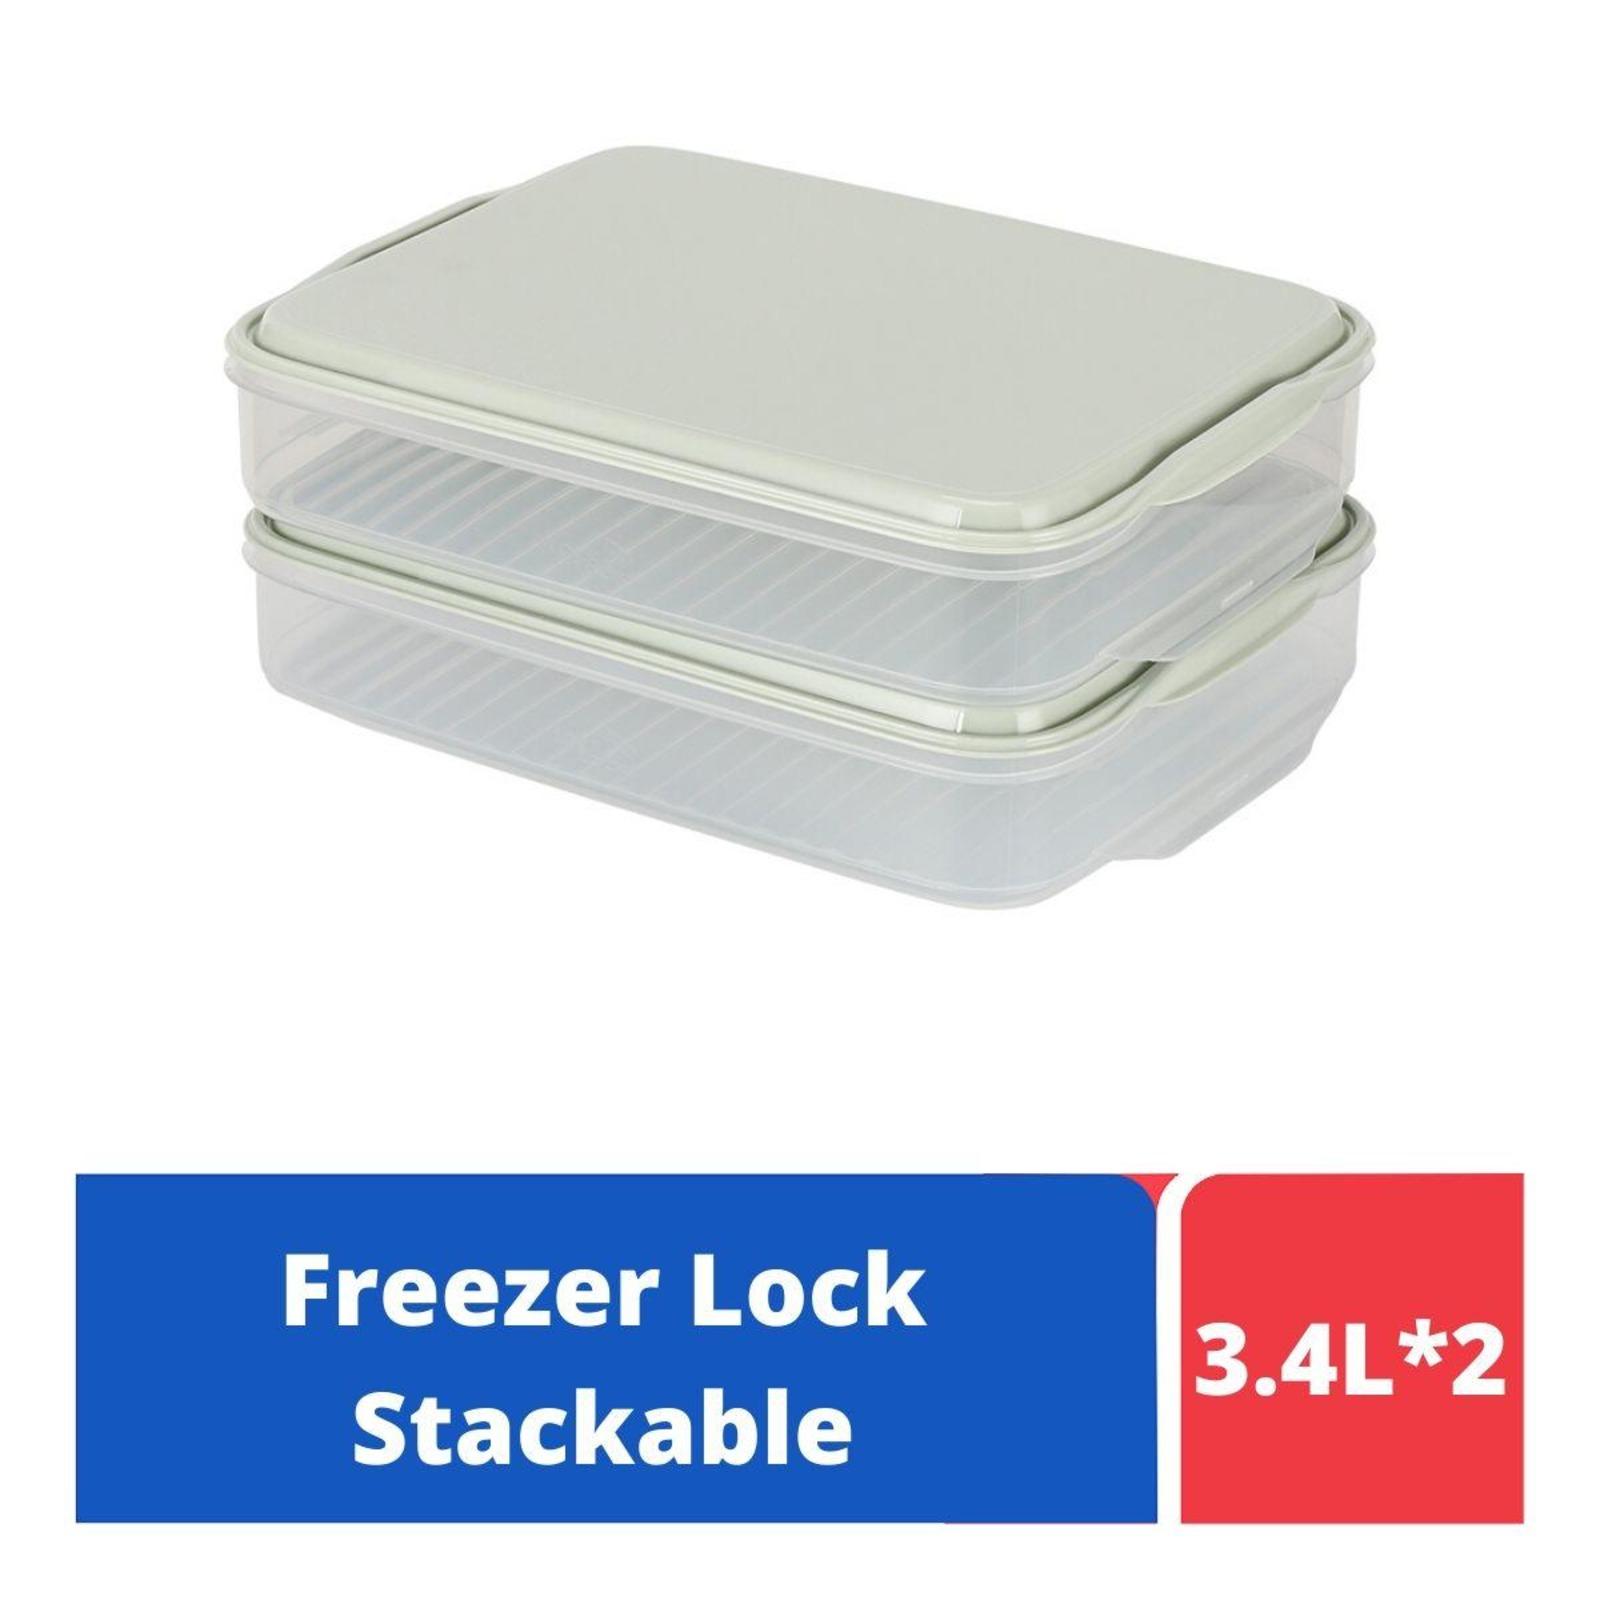 LOCK&LOCK Freezer Lock Container 2P Set Rect 3.4L - Mint